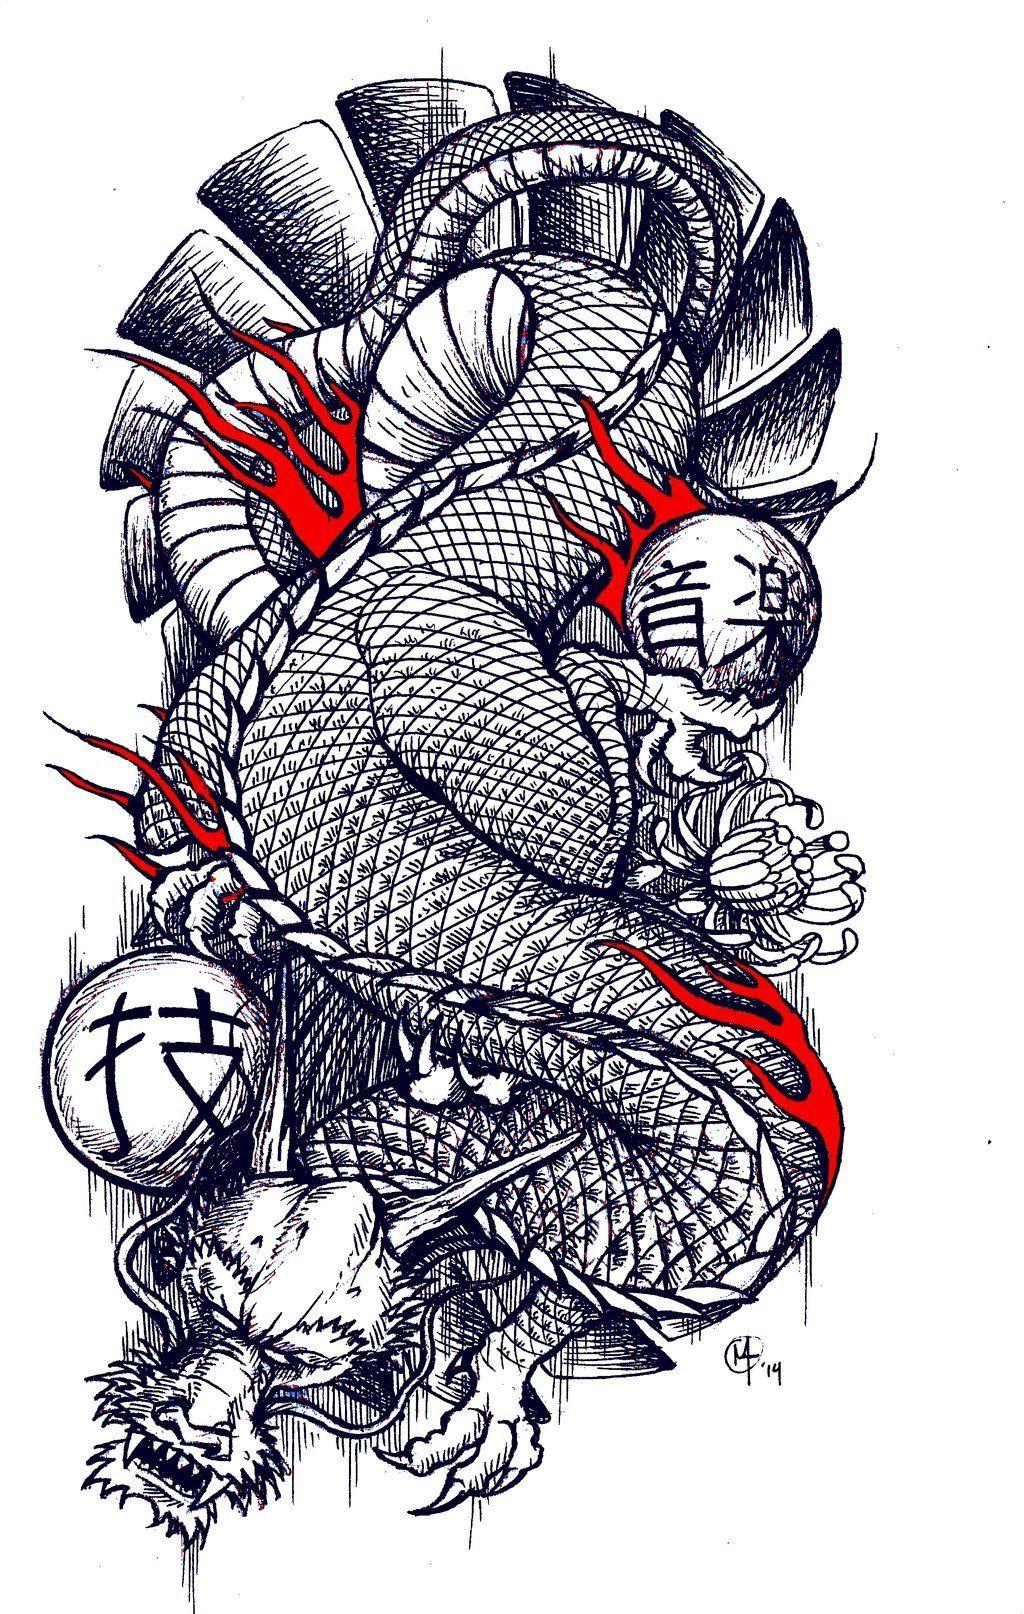 Traditional Japanese Dragon Tattoo Design By Miketooch Deviantart Com On Deviantart Japanese Dragon Tattoos Japanese Dragon Tattoo Dragon Tattoo Designs